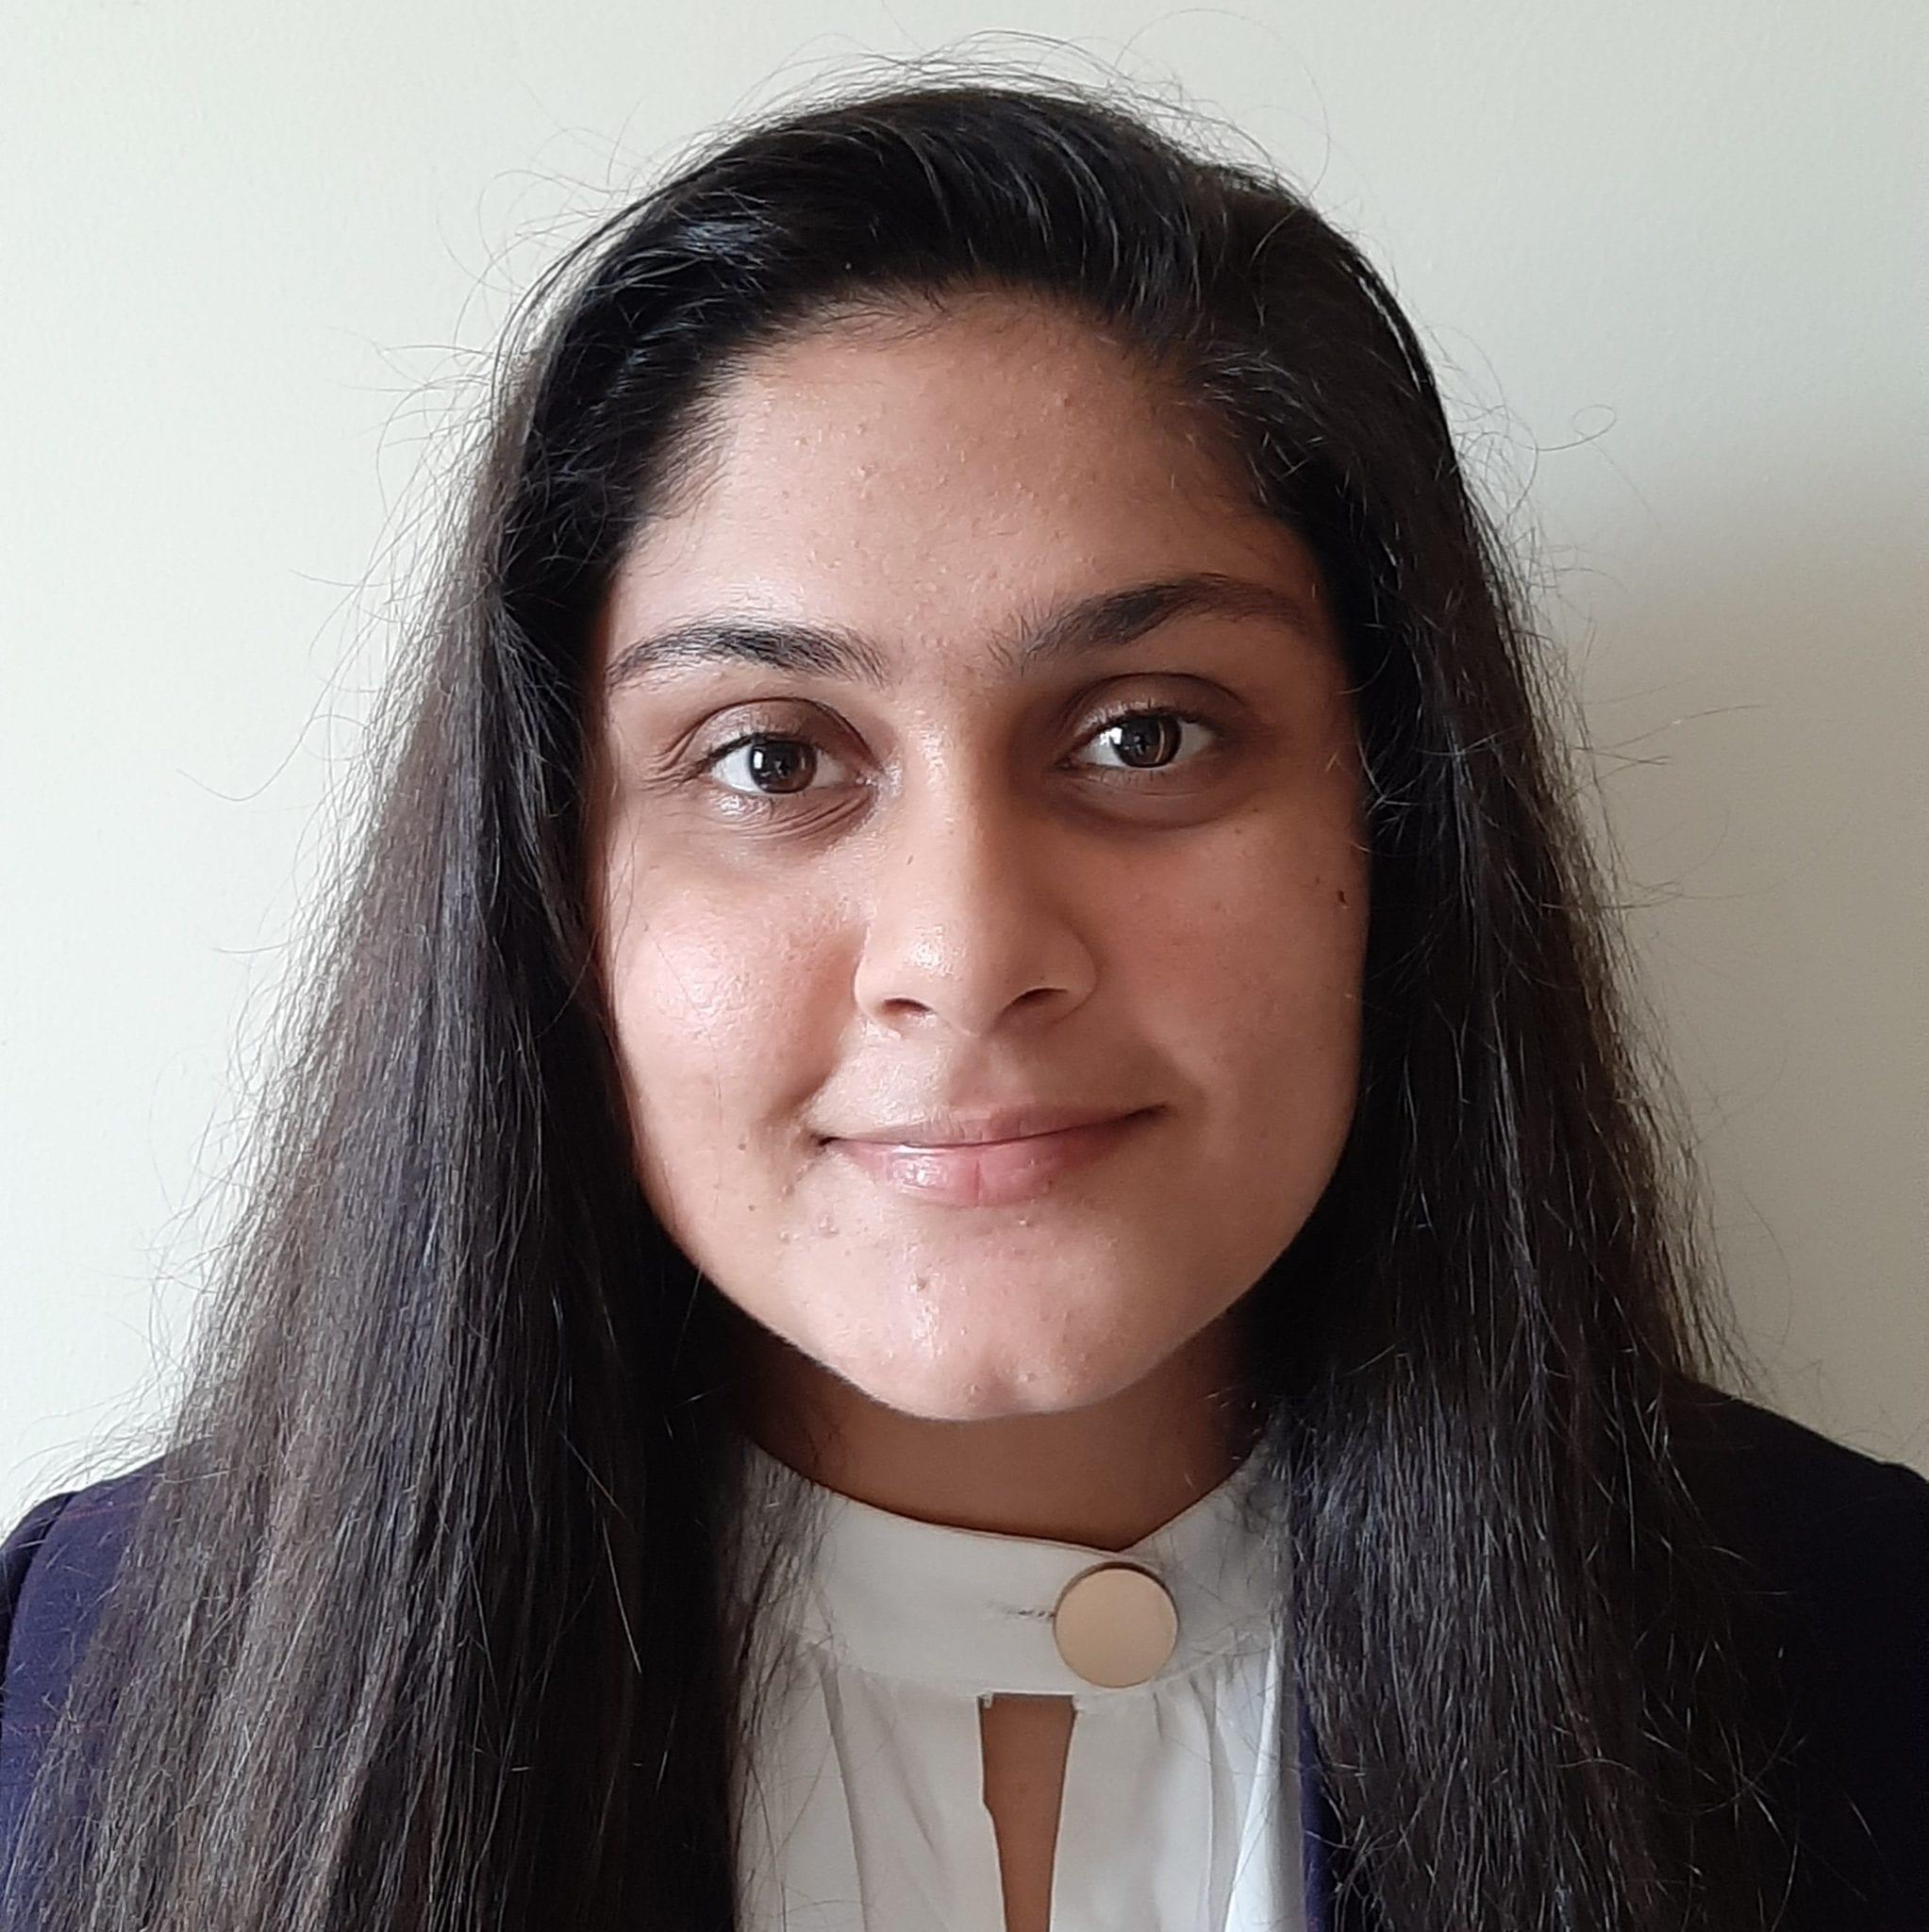 York University international student Mishal Vellani